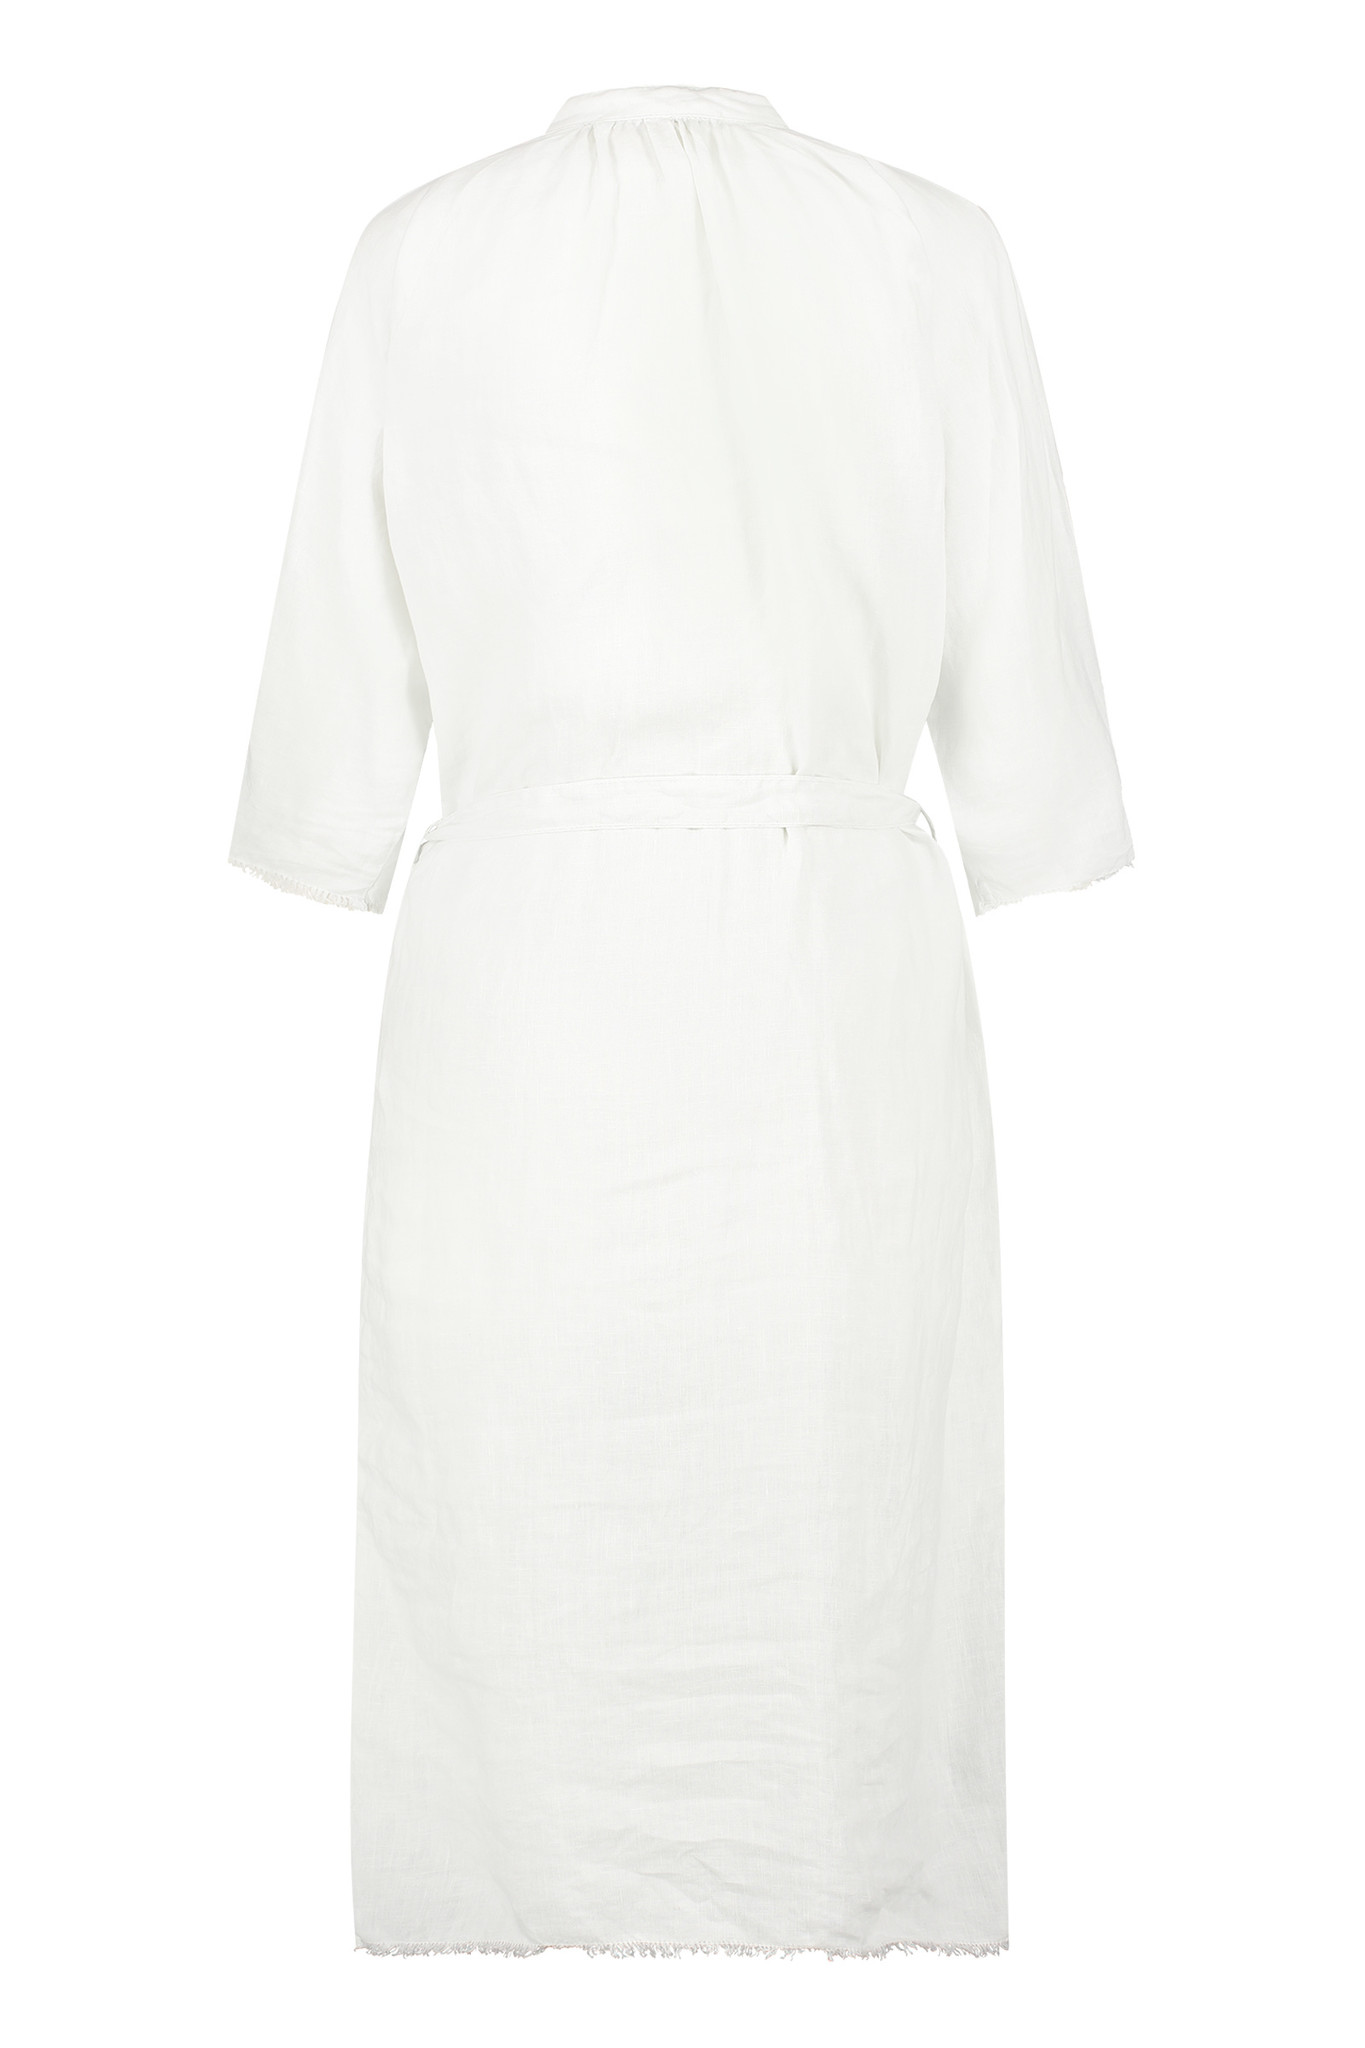 Penn & Ink Dress S21F904-2